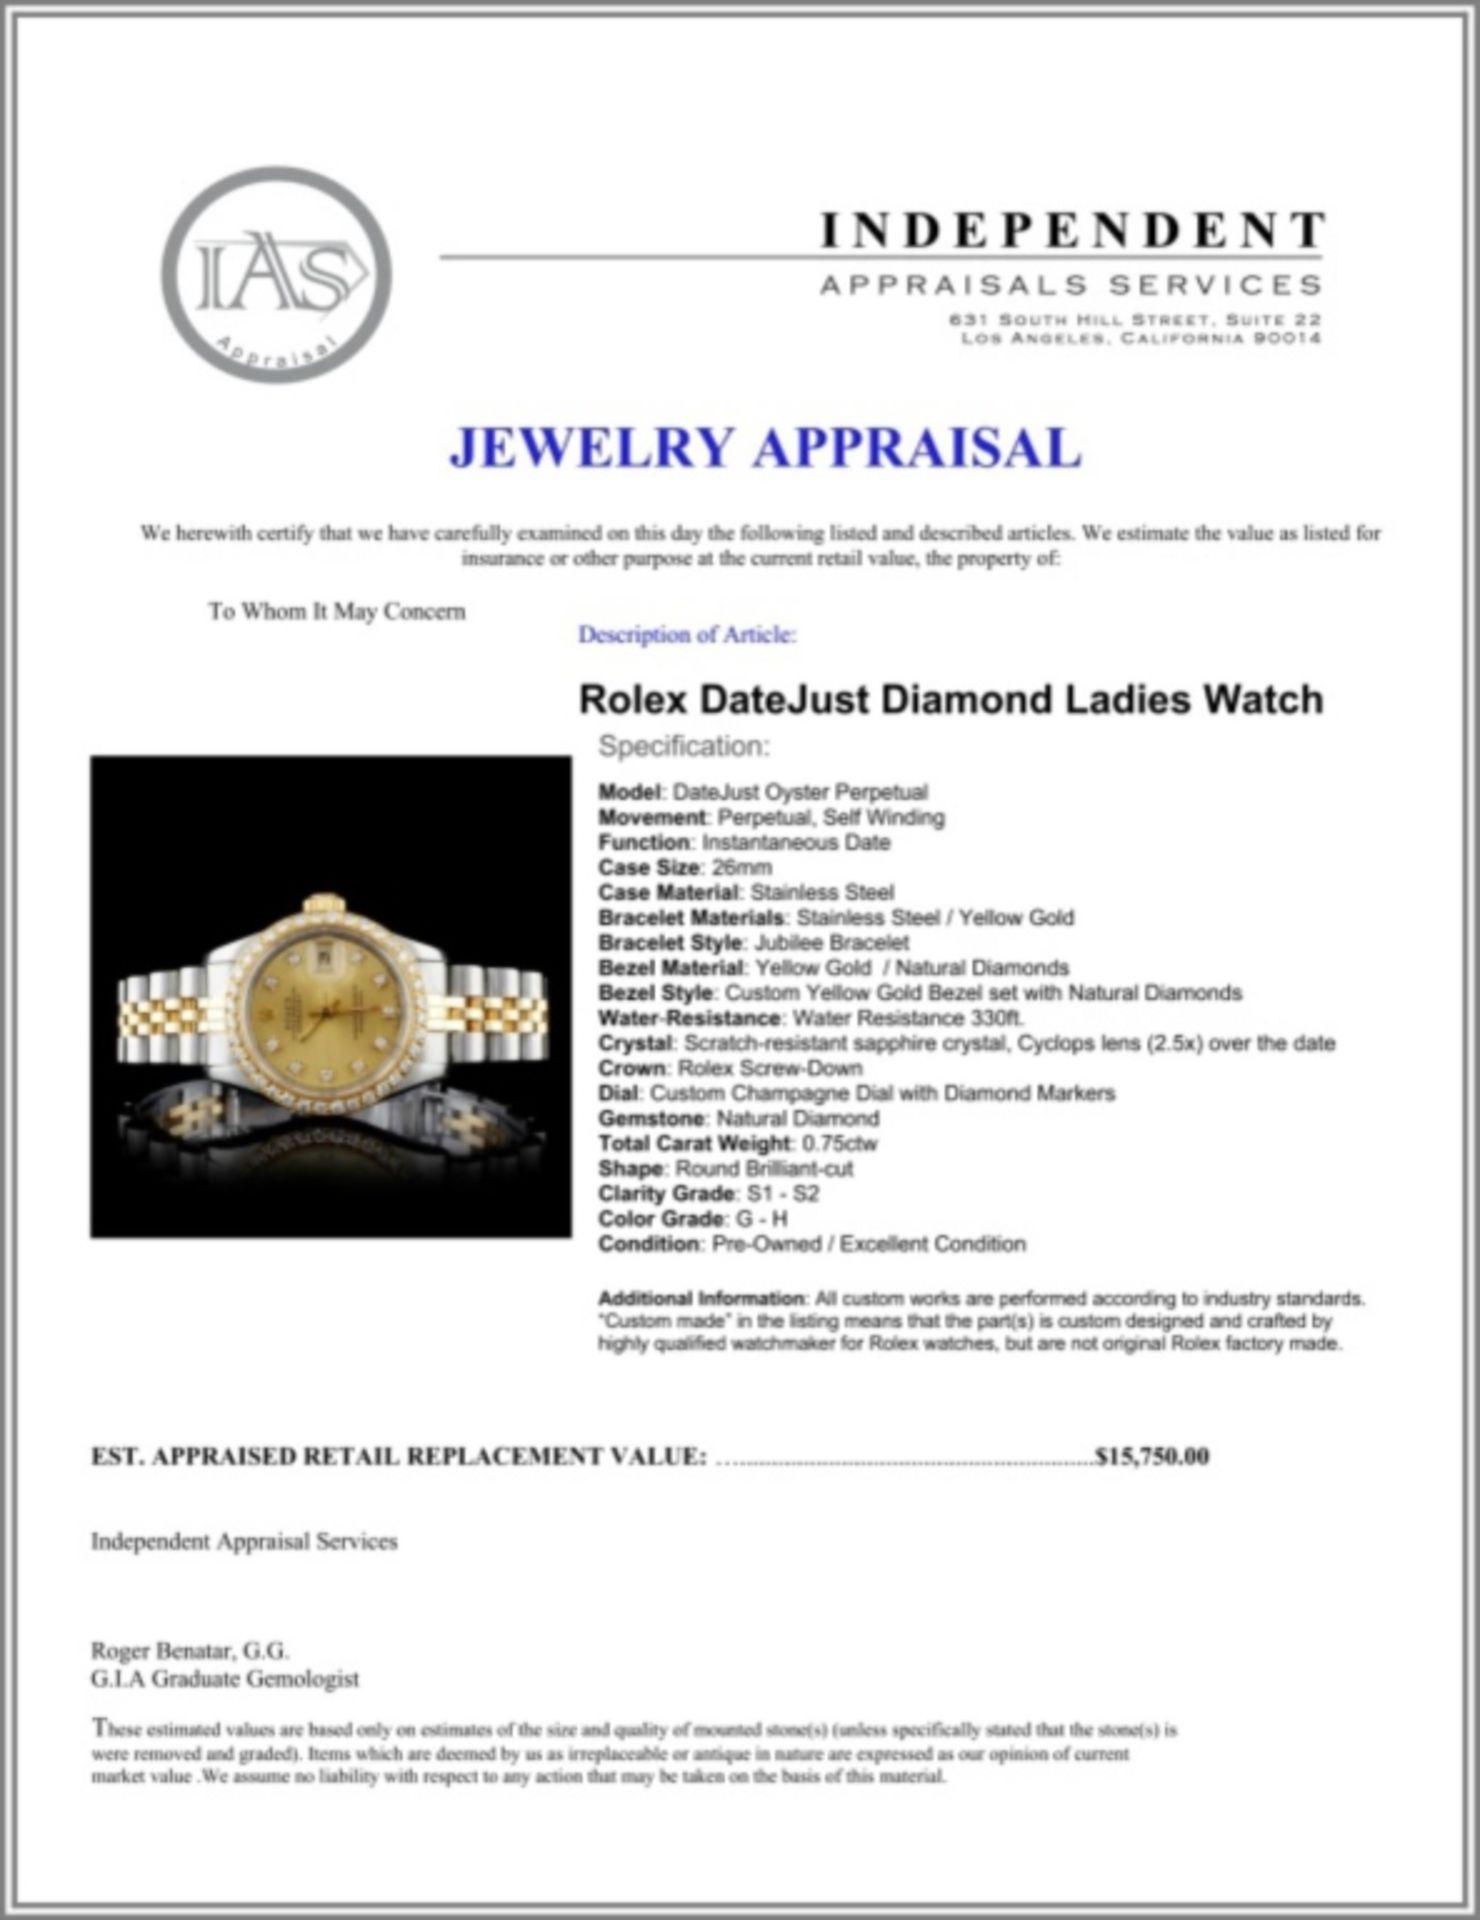 Rolex DateJust Diamond Ladies Watch - Image 5 of 5